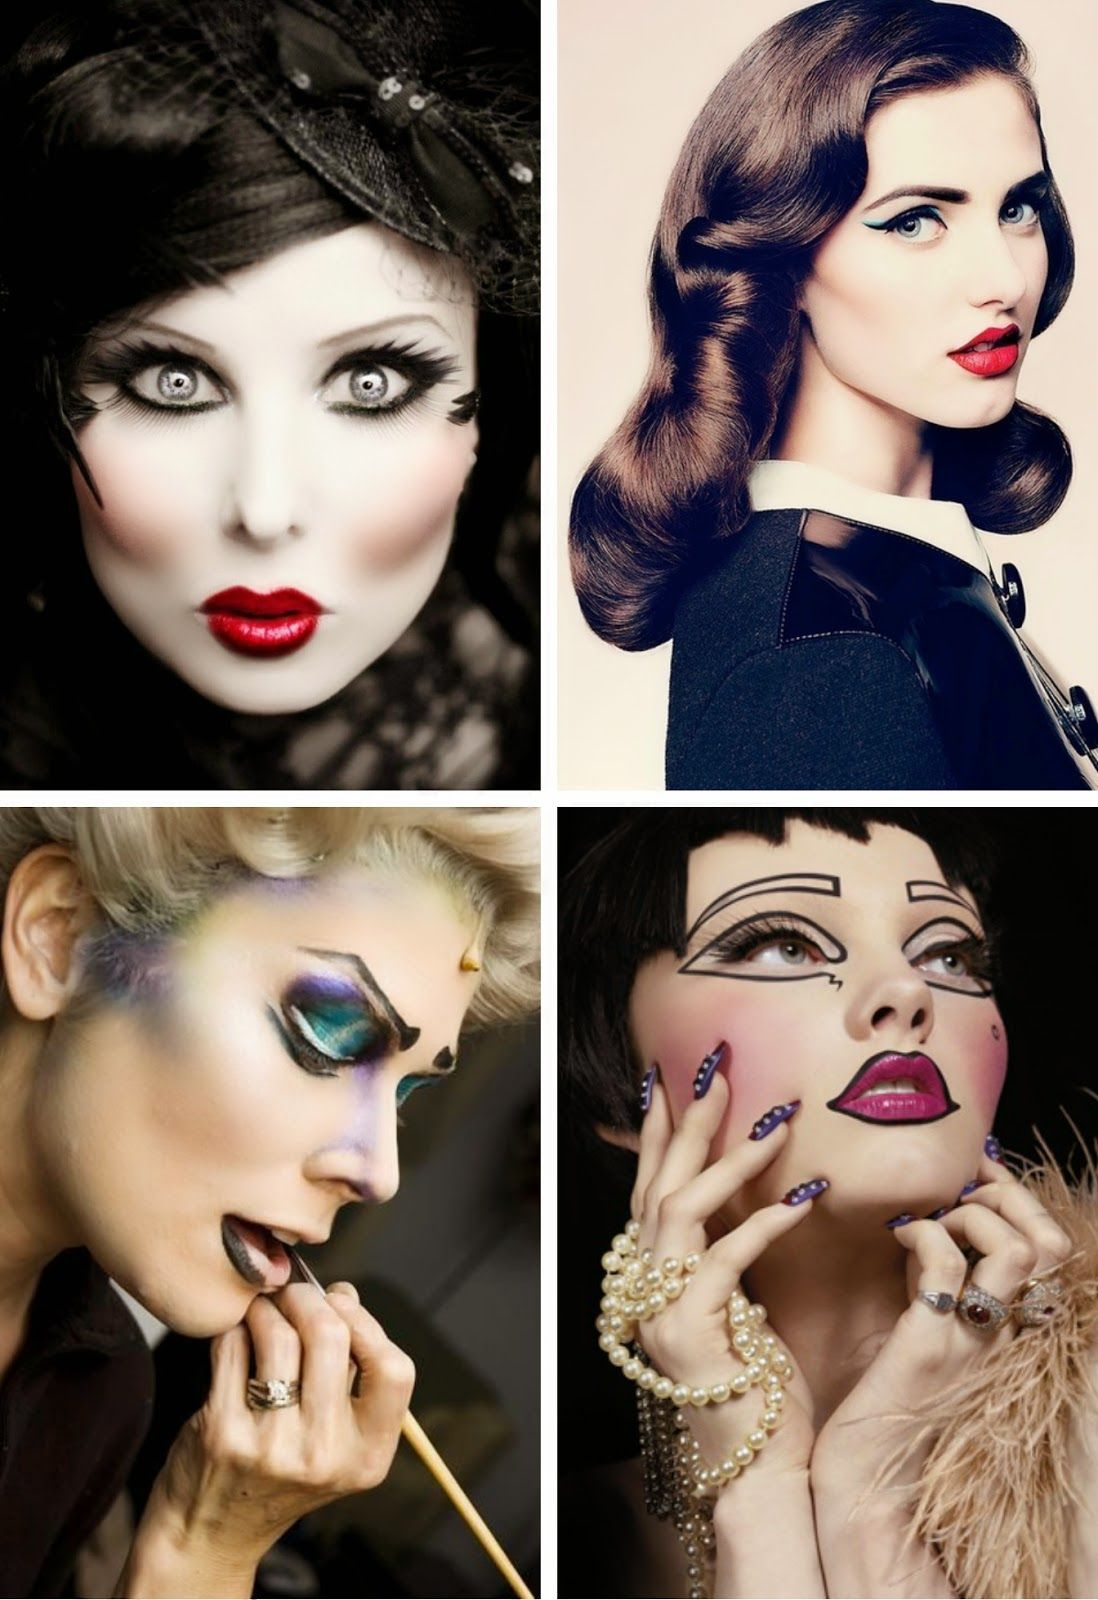 5 Best Broadway Inspired Makeup Video Tutorials Lost In Daydreams Makeup Videos Makeup Inspiration Beauty Makeup Tutorial